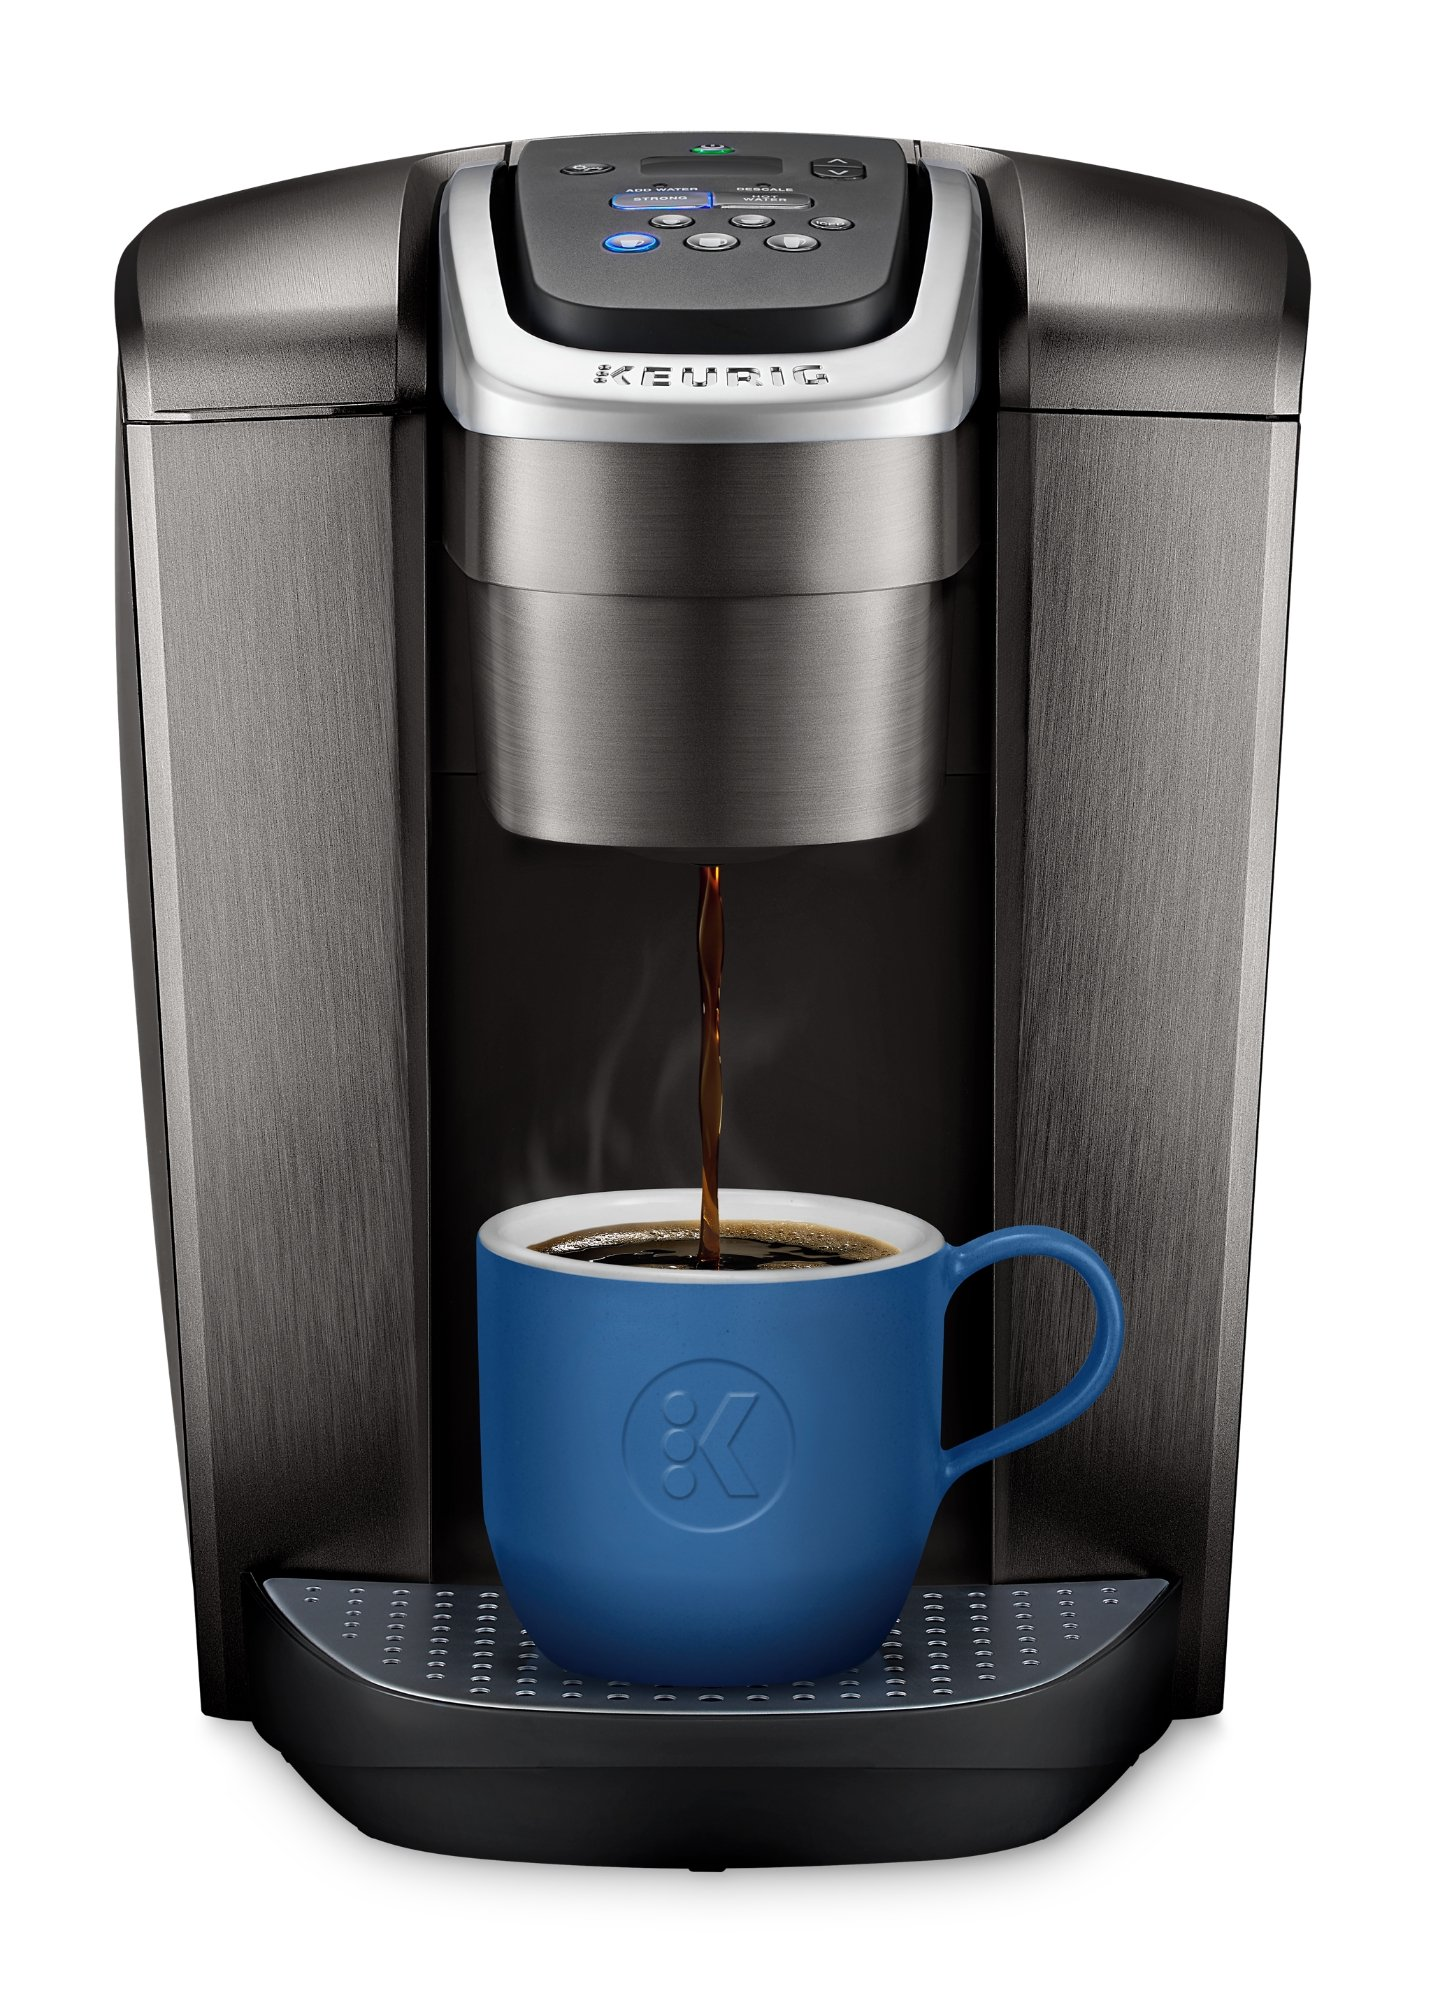 Keurig K-Elite Coffee Maker, Single Serve K-Cup Pod Coffee Brewer, With Iced Coffee Capability, Brushed Slate by Keurig